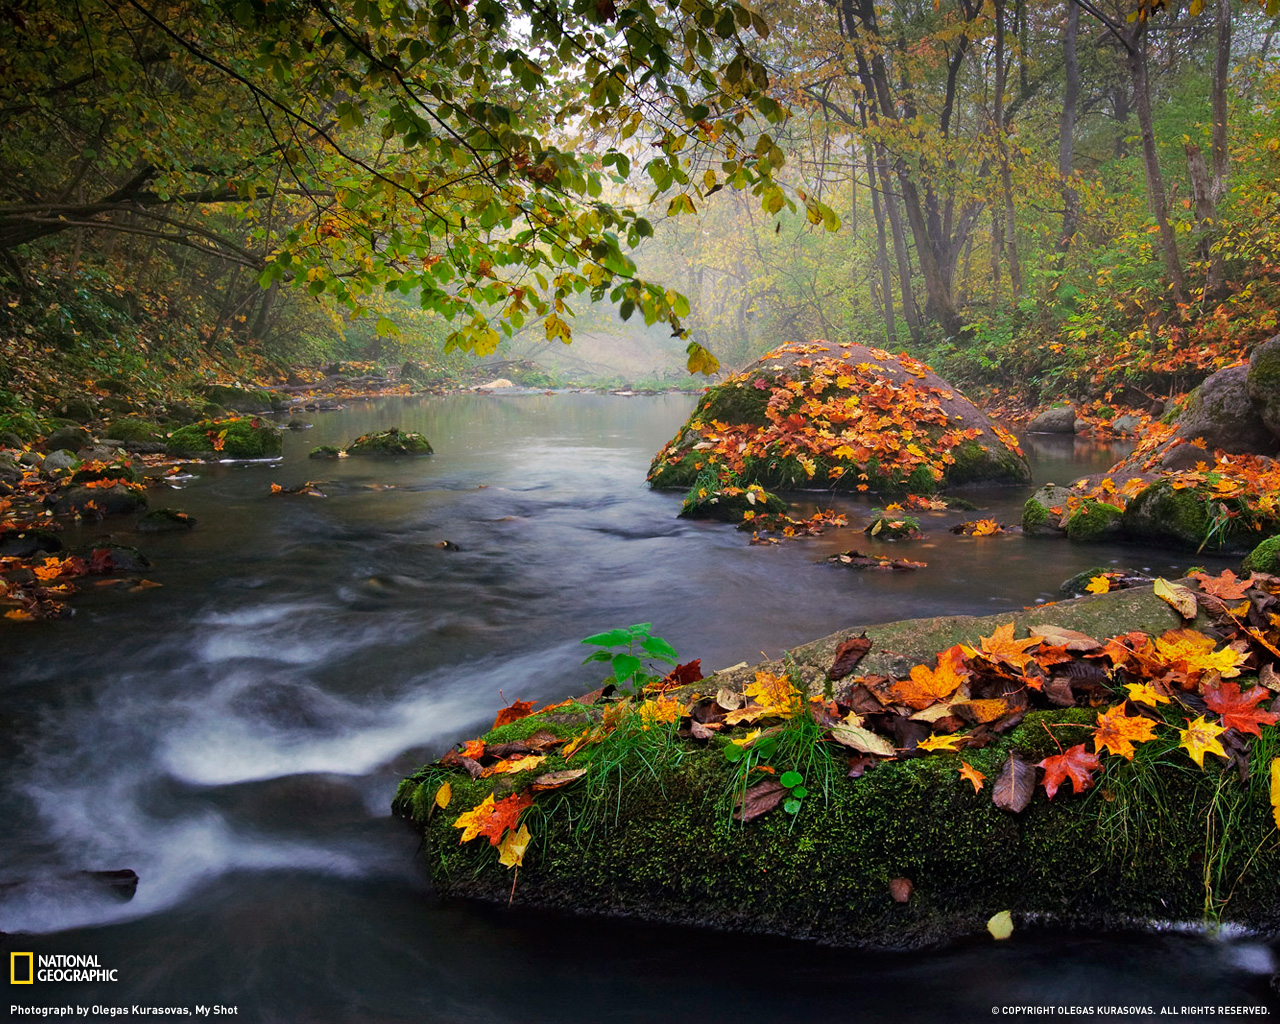 Autumn Landscape Photo Nature Wallpaper National Geographic 1280x1024